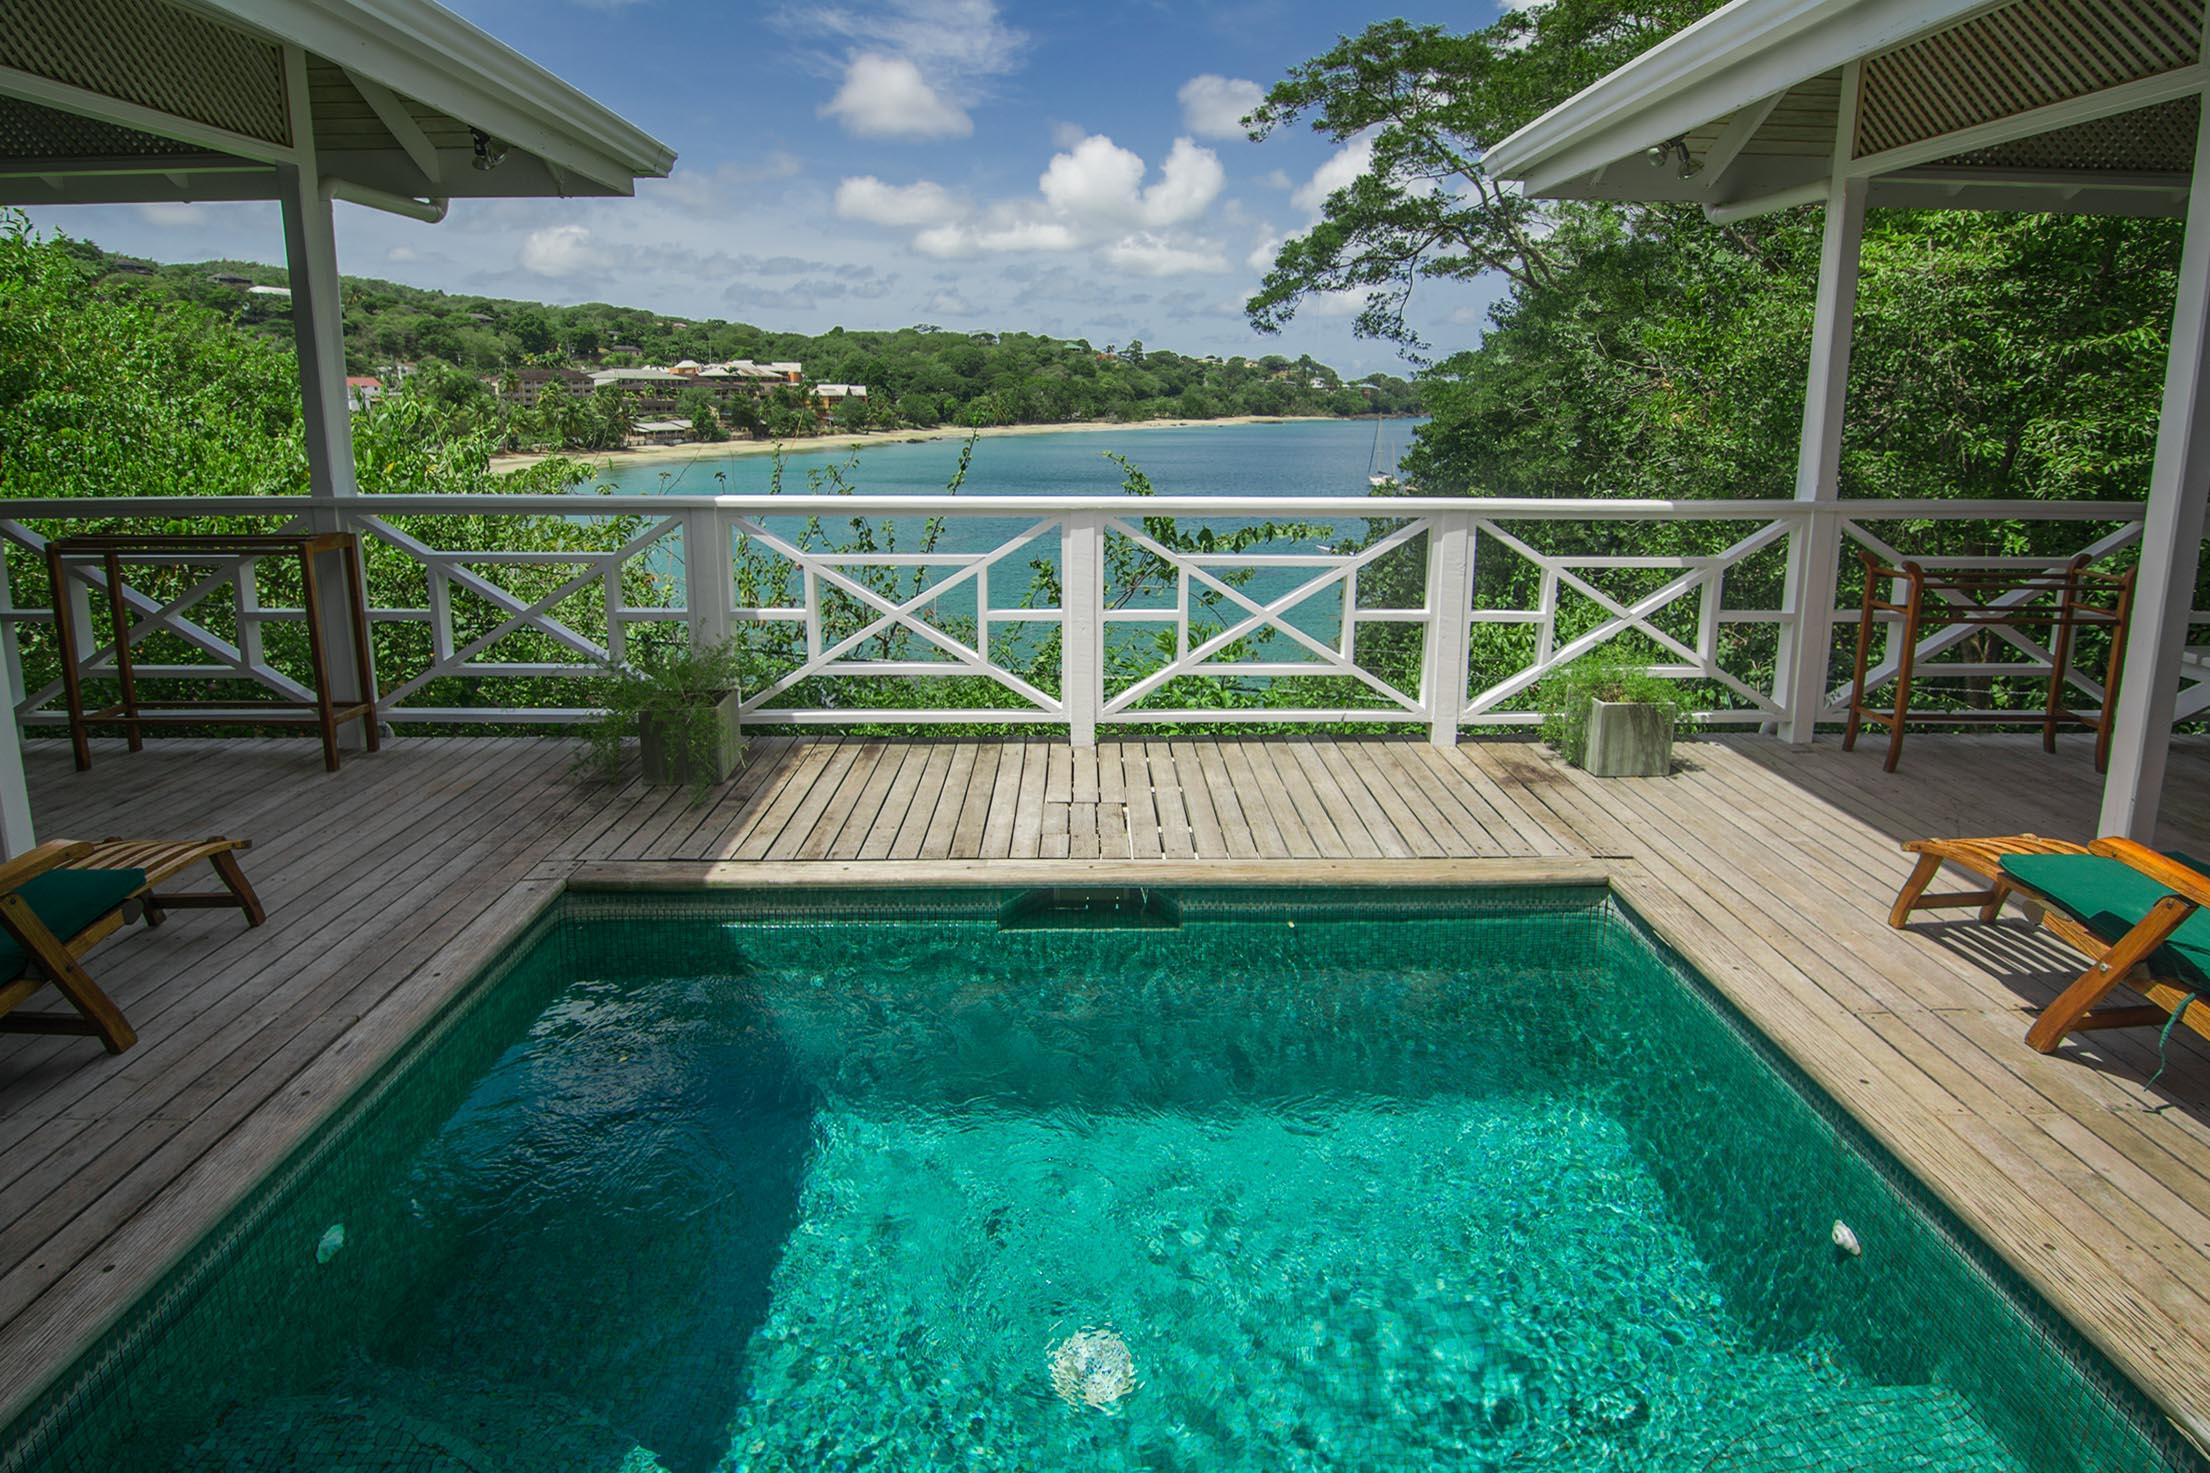 Licorish Villa Tobago Pool and Deck Area